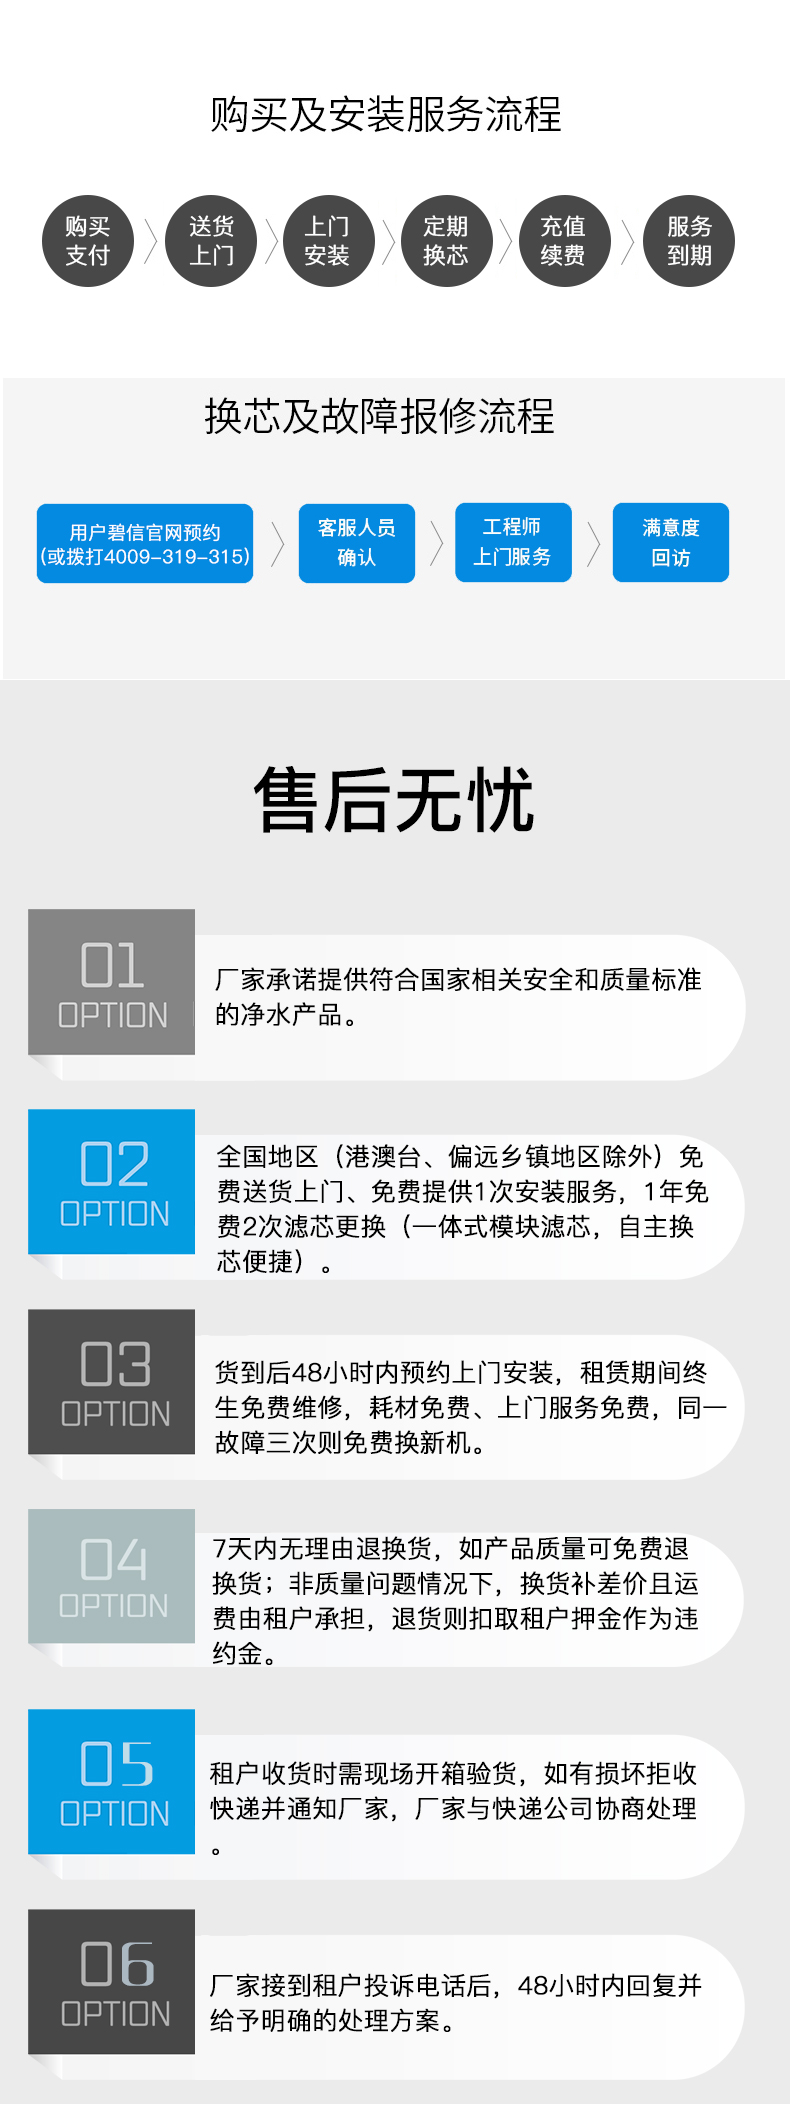 R19G租赁_09.jpg